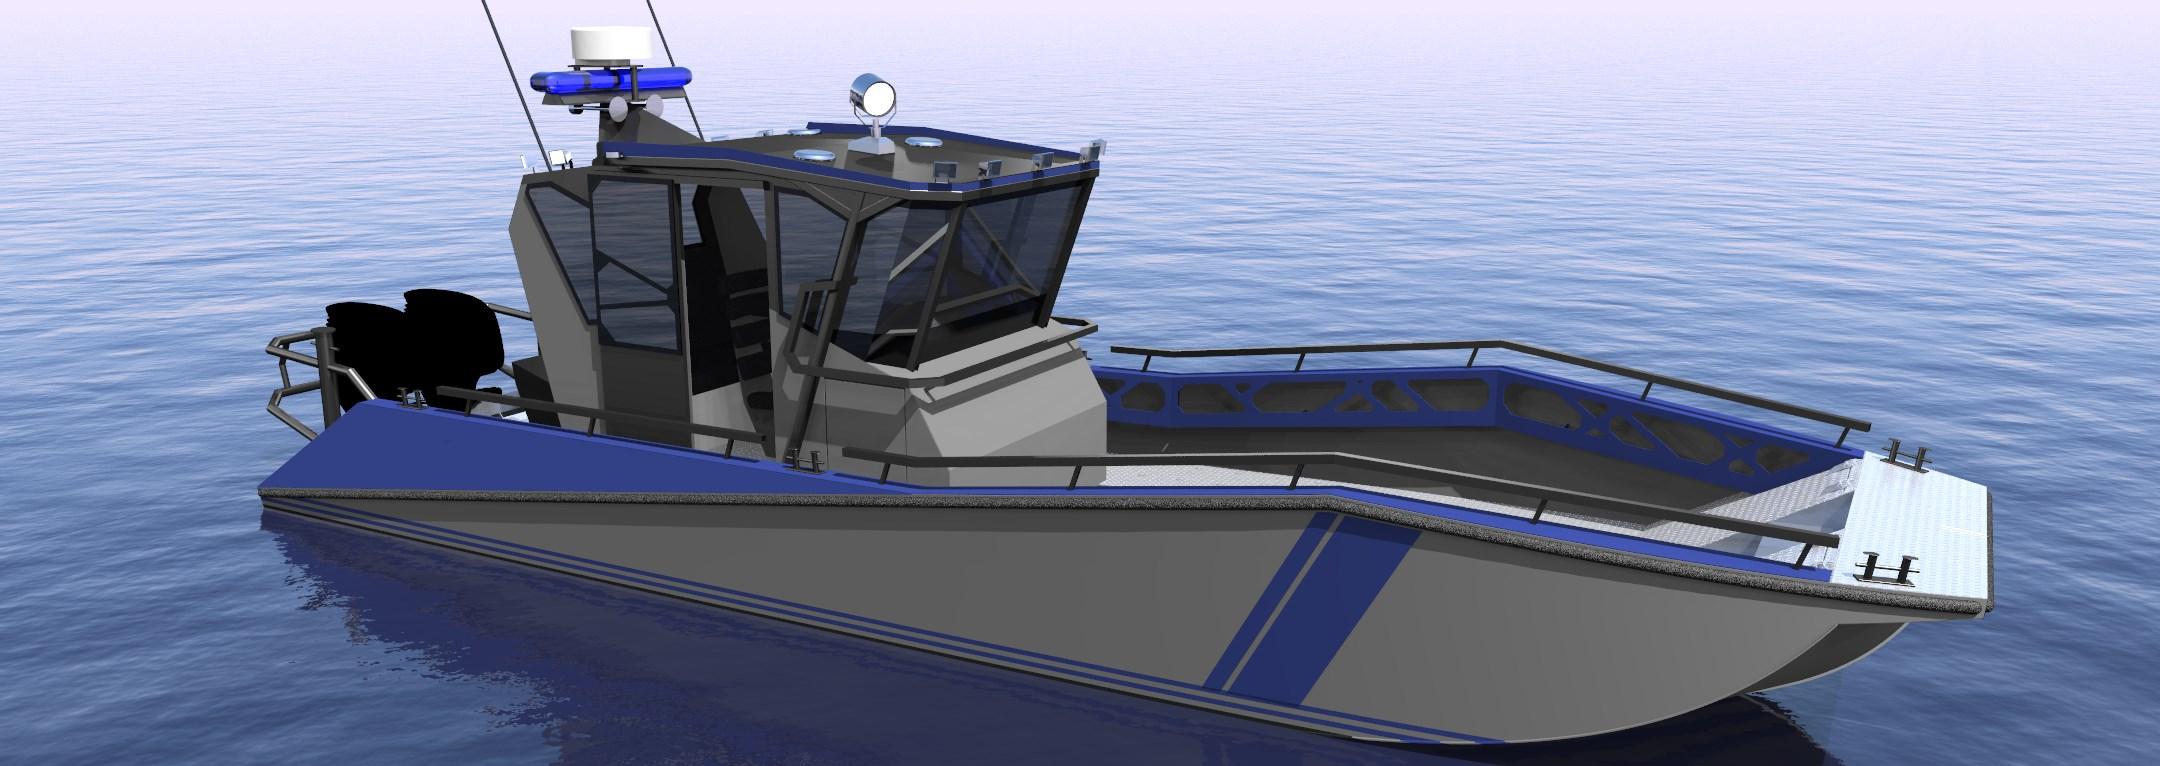 Lake patrol boat